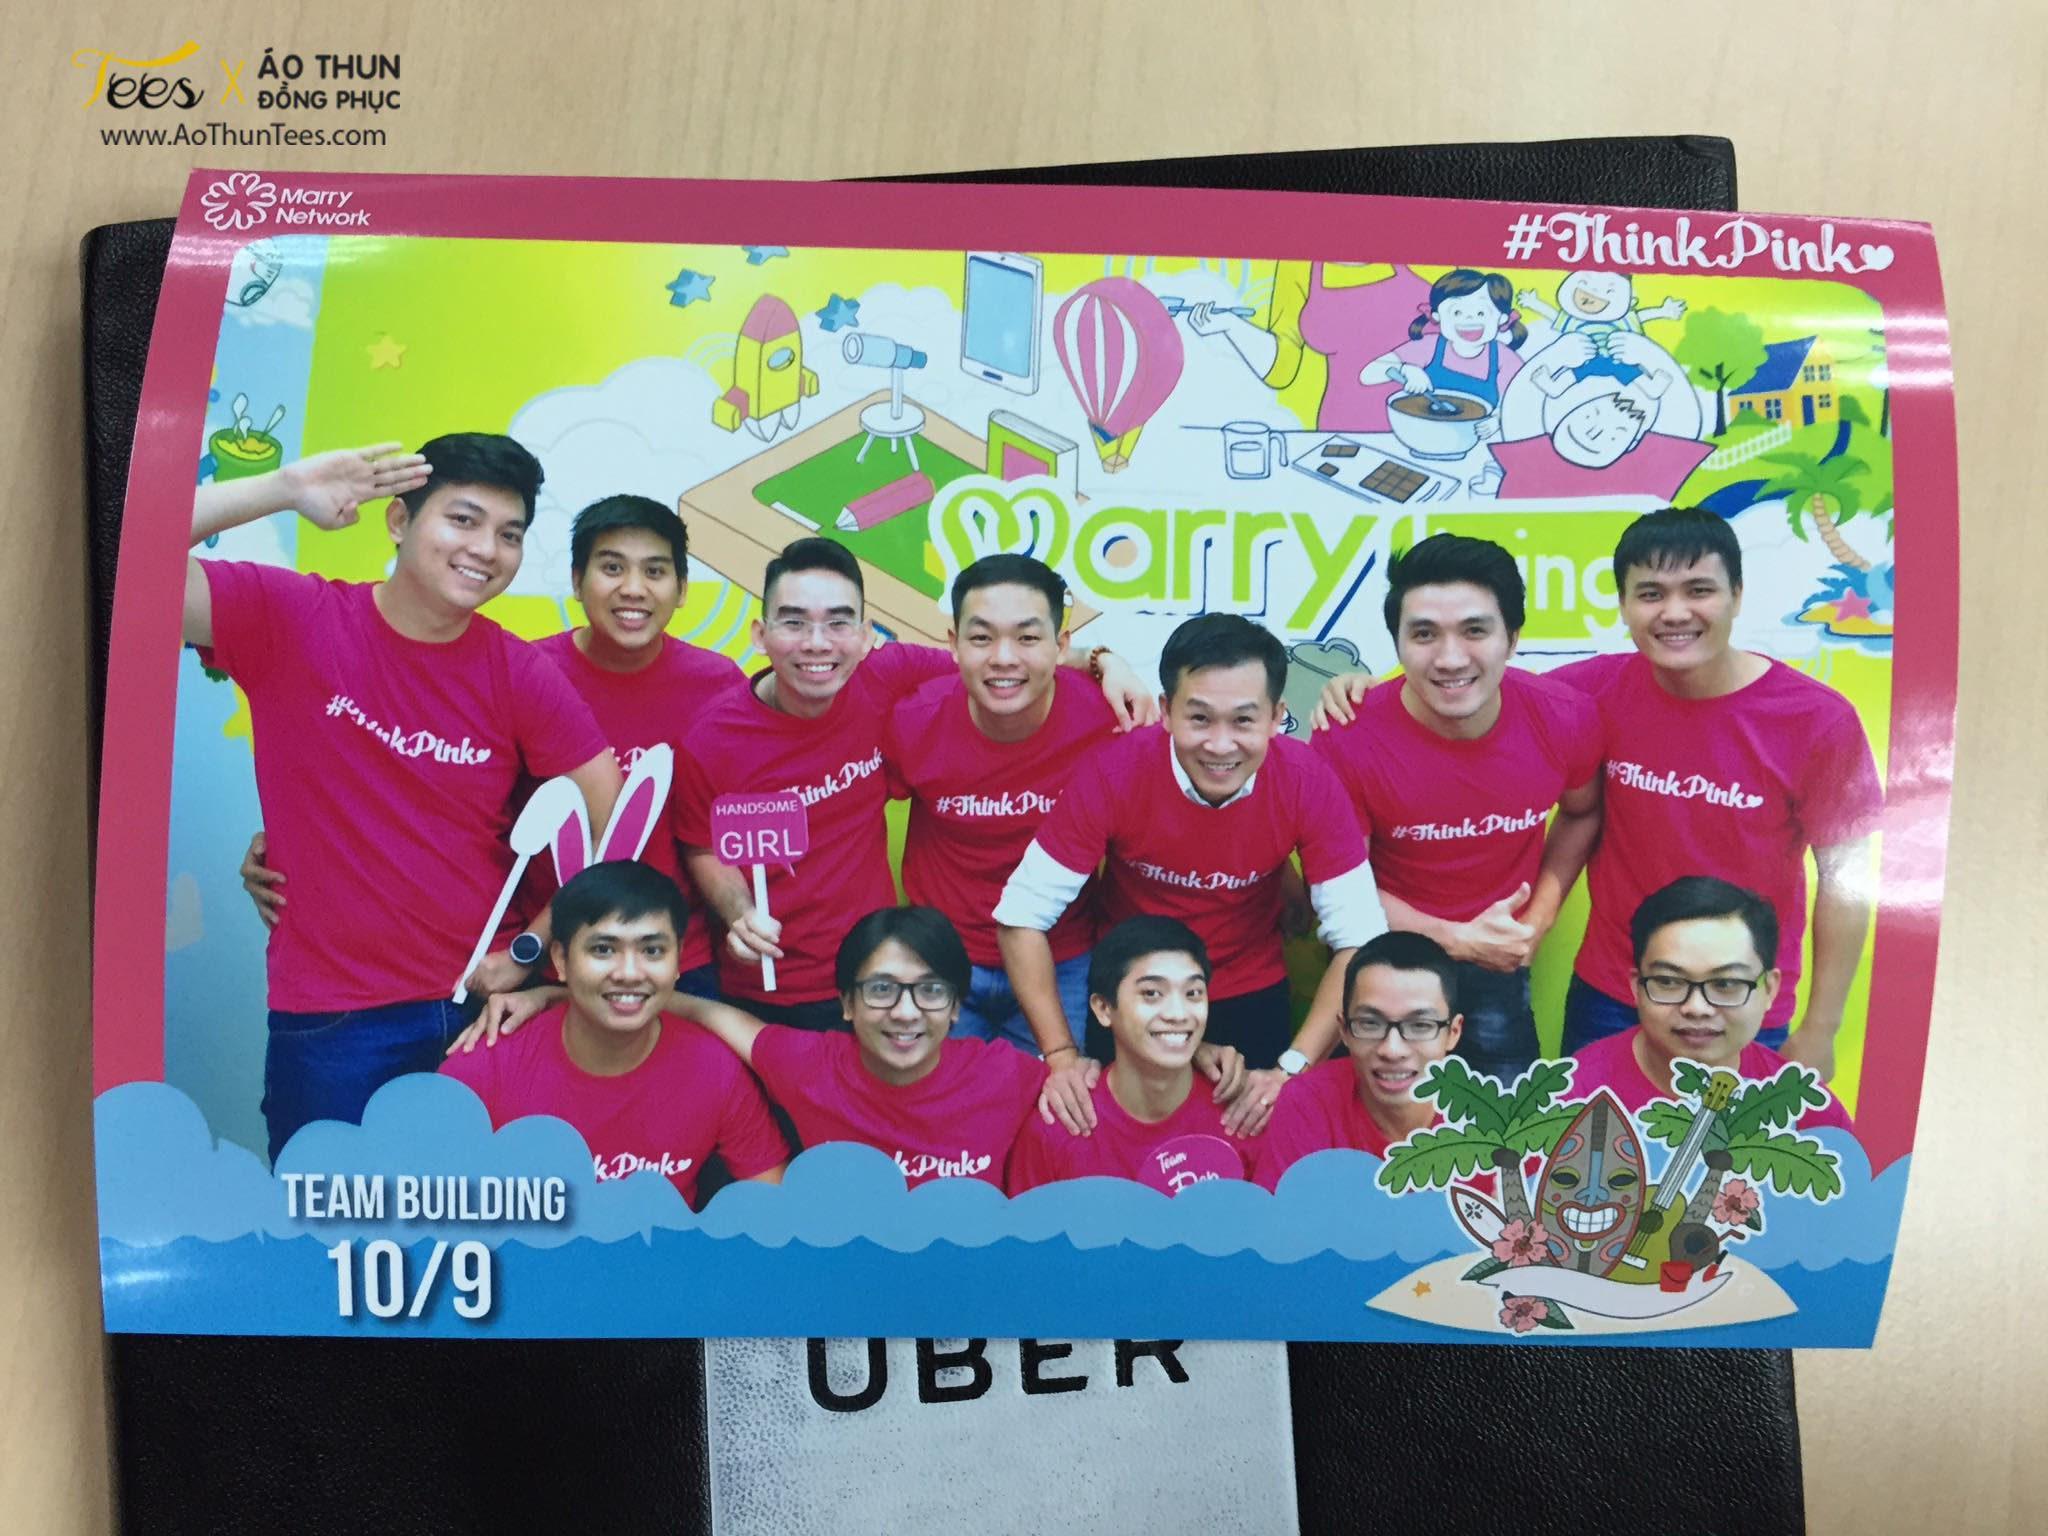 thinkpink marryvn 1a - Ửng hồng áo thun Teambuilding #ThinkPink – Marry.vn